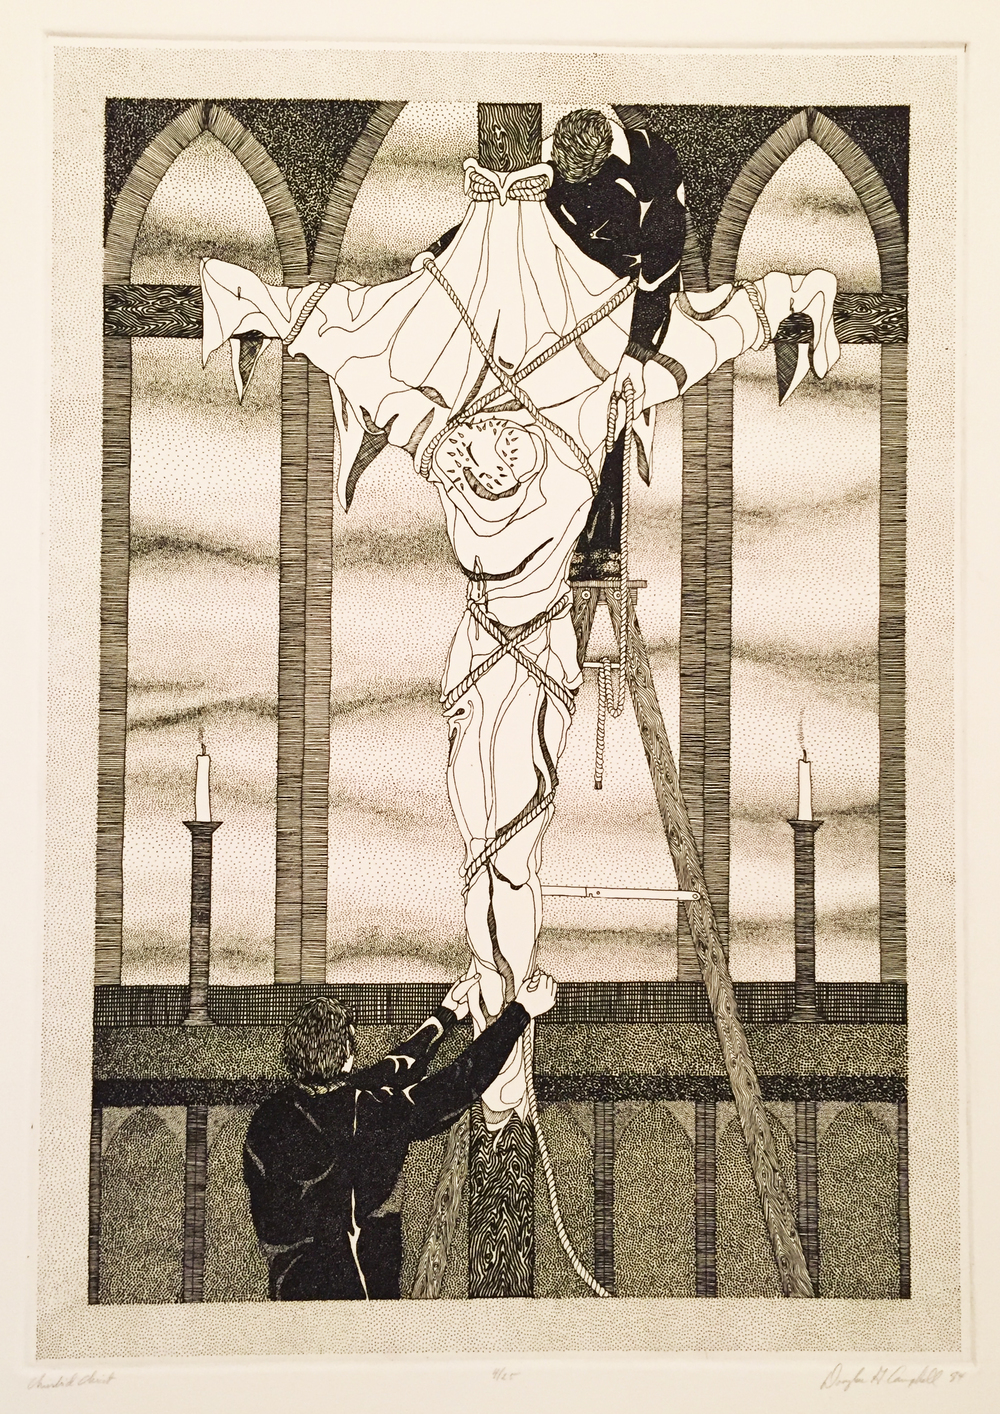 Christo'd Christ